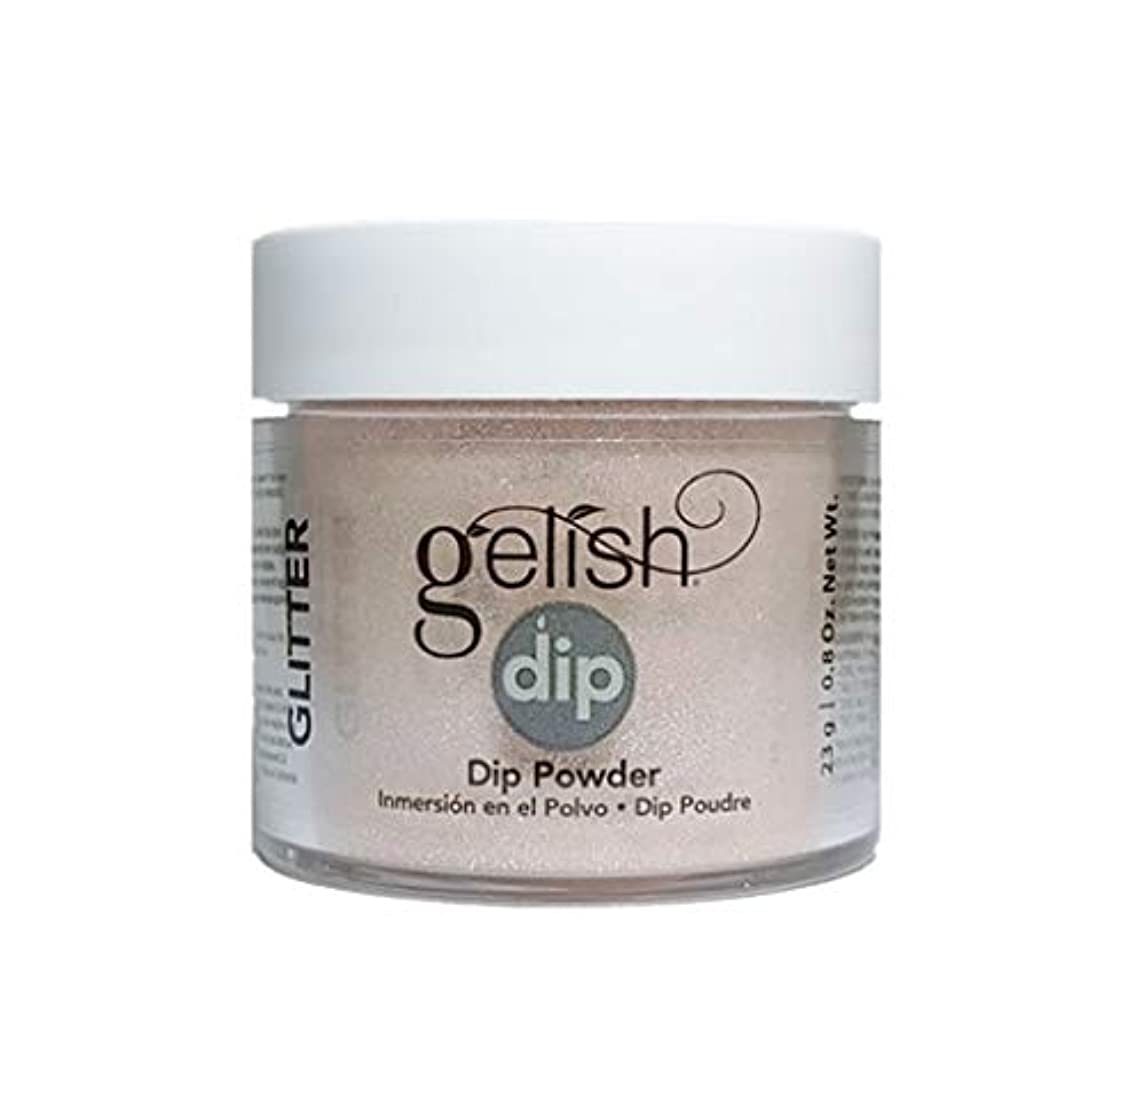 Harmony Gelish - Dip Powder - Bronzed - 23g / 0.8oz